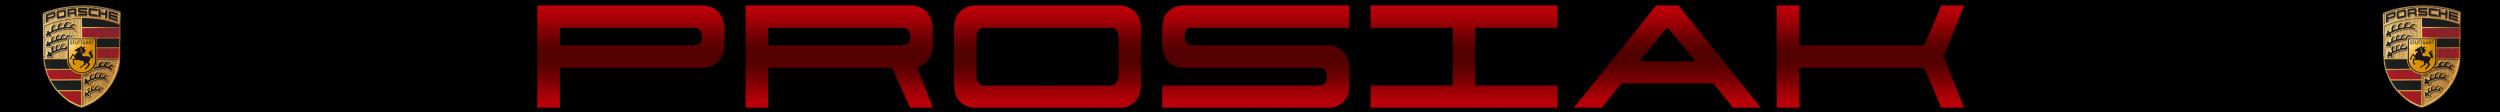 flaga_niemcy_ramka.png